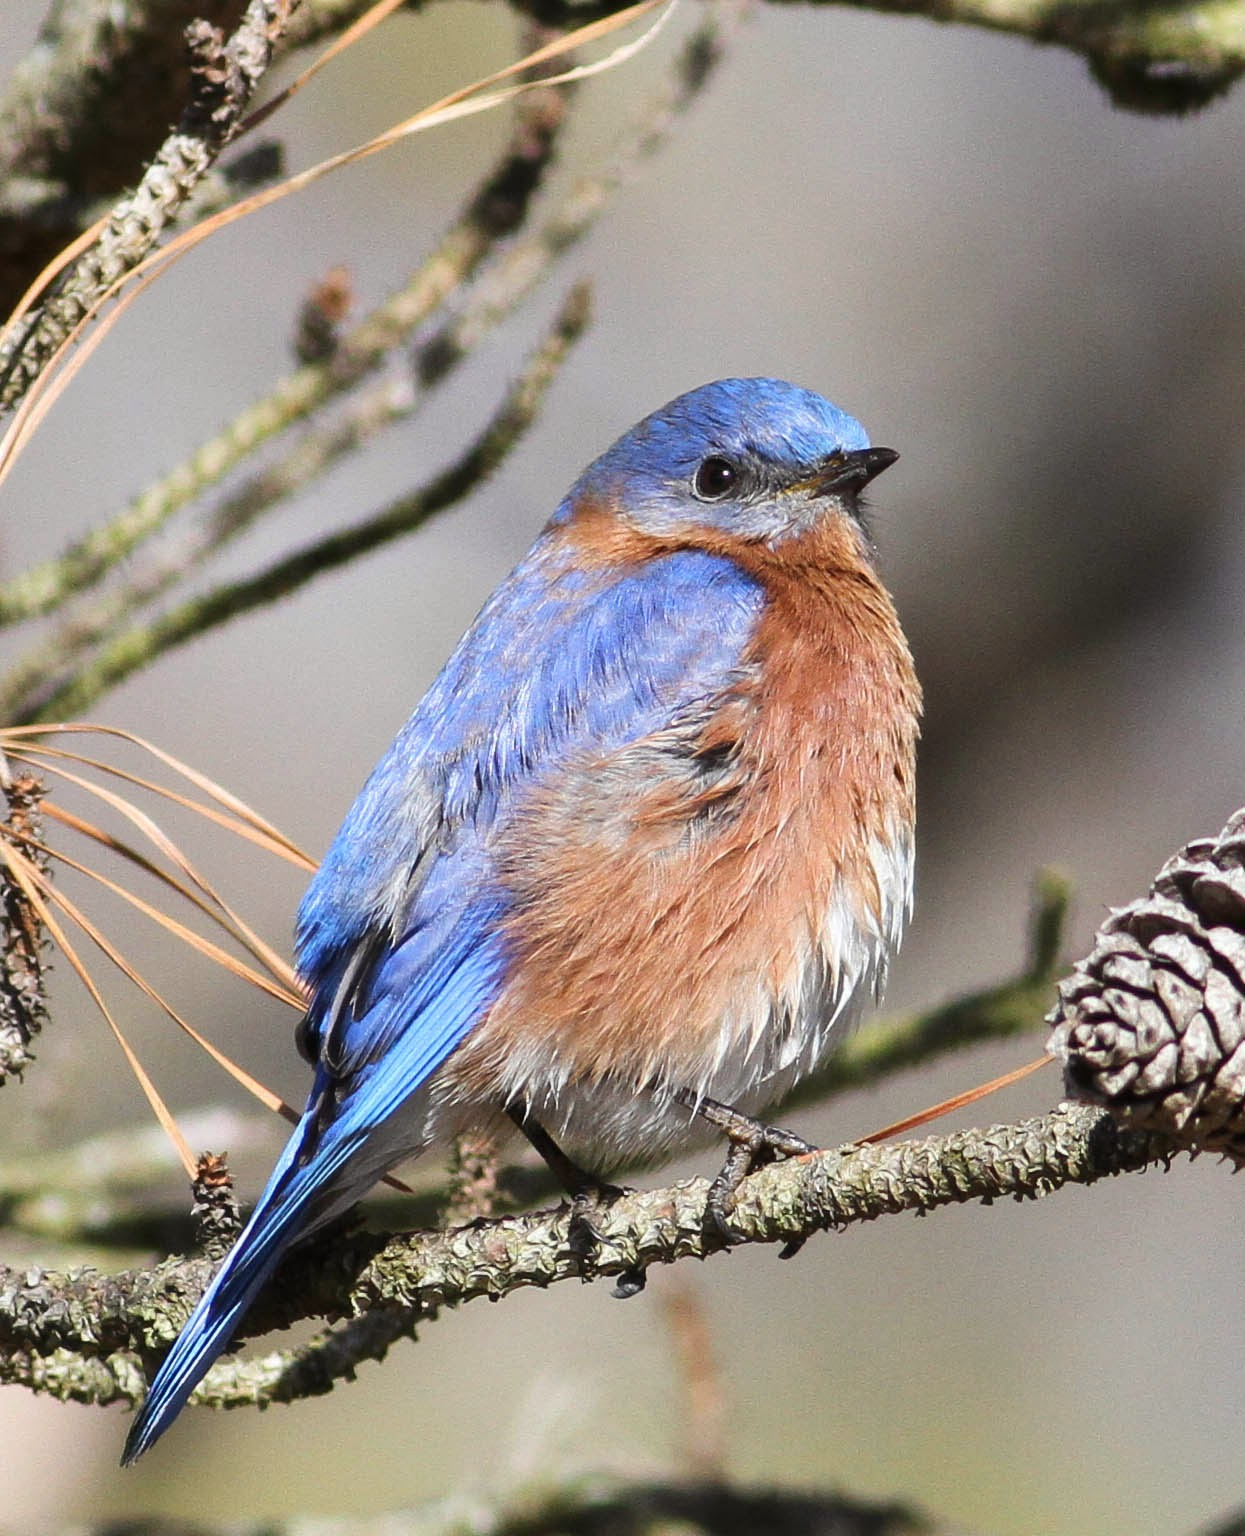 common birds in virginia choice image